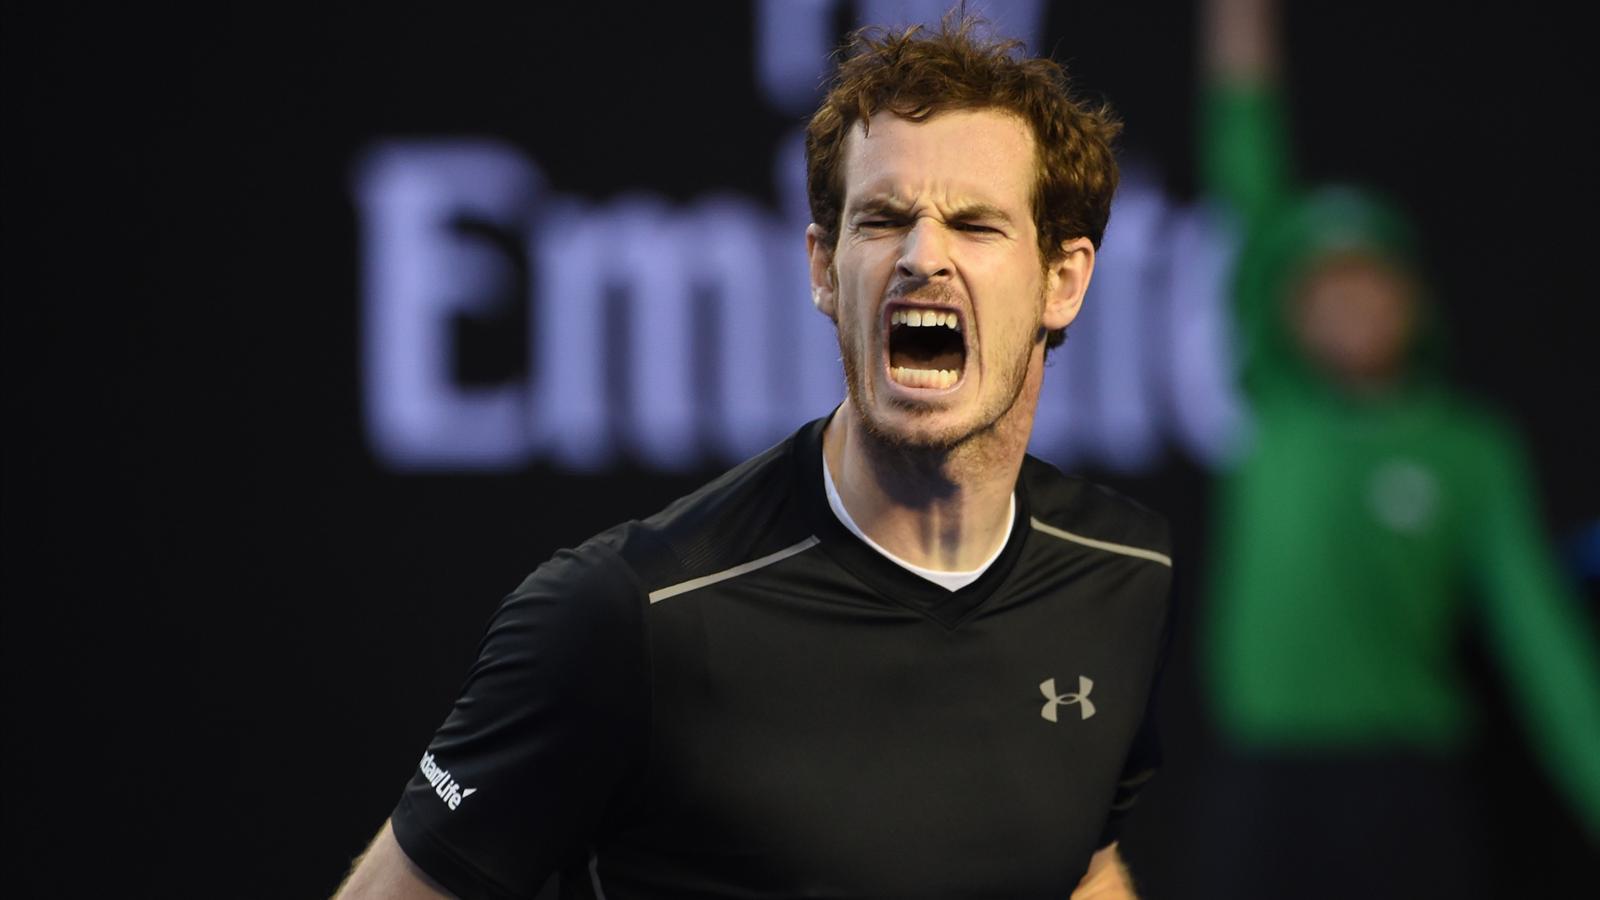 Andy Murray - Australian Open 2016